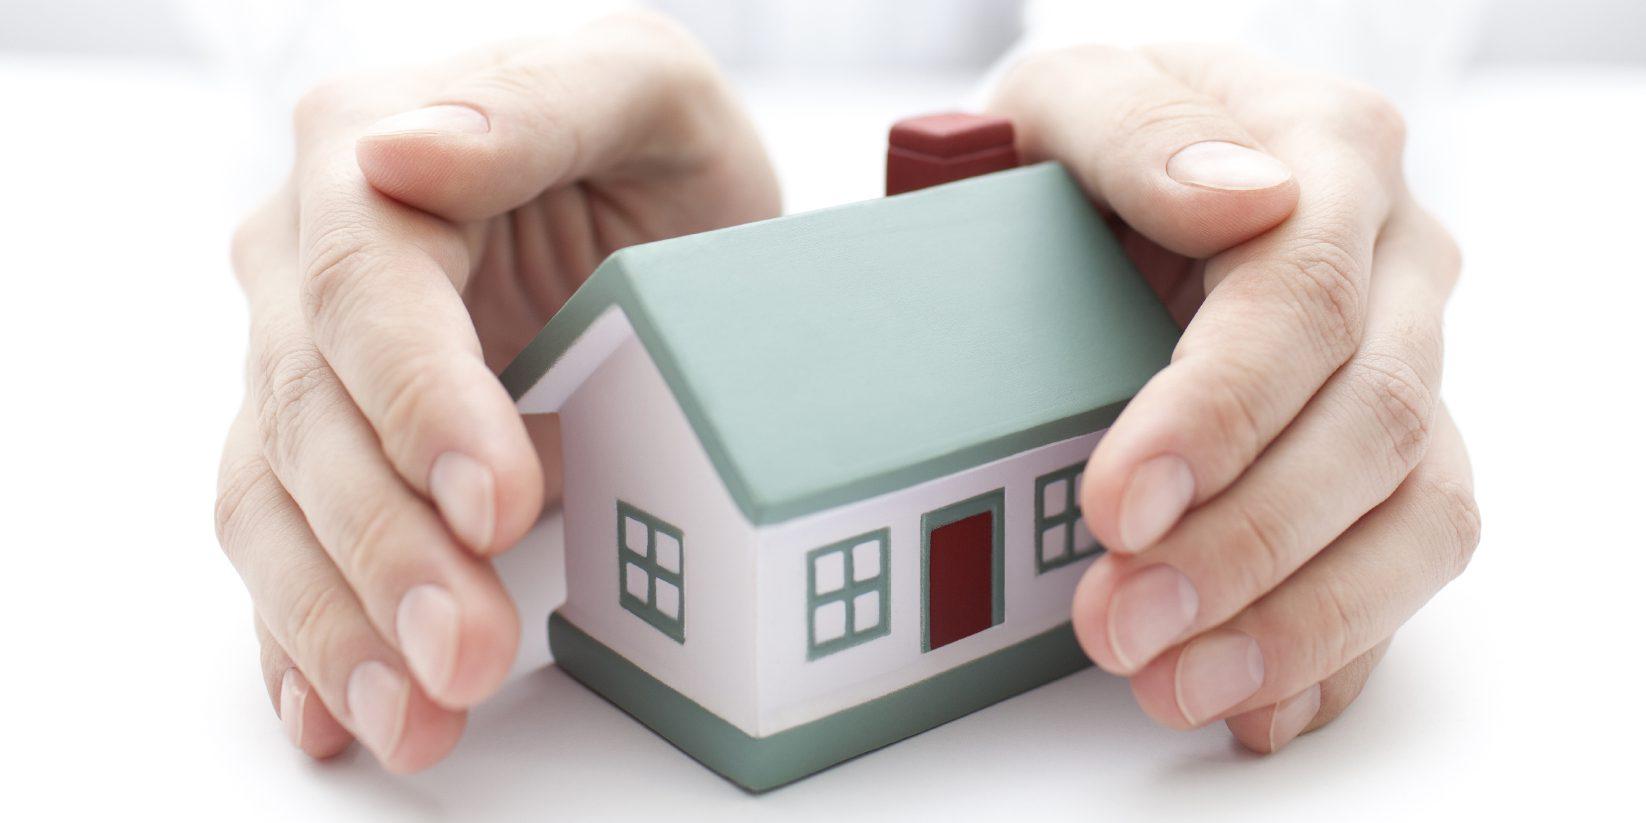 calgary infills home safety